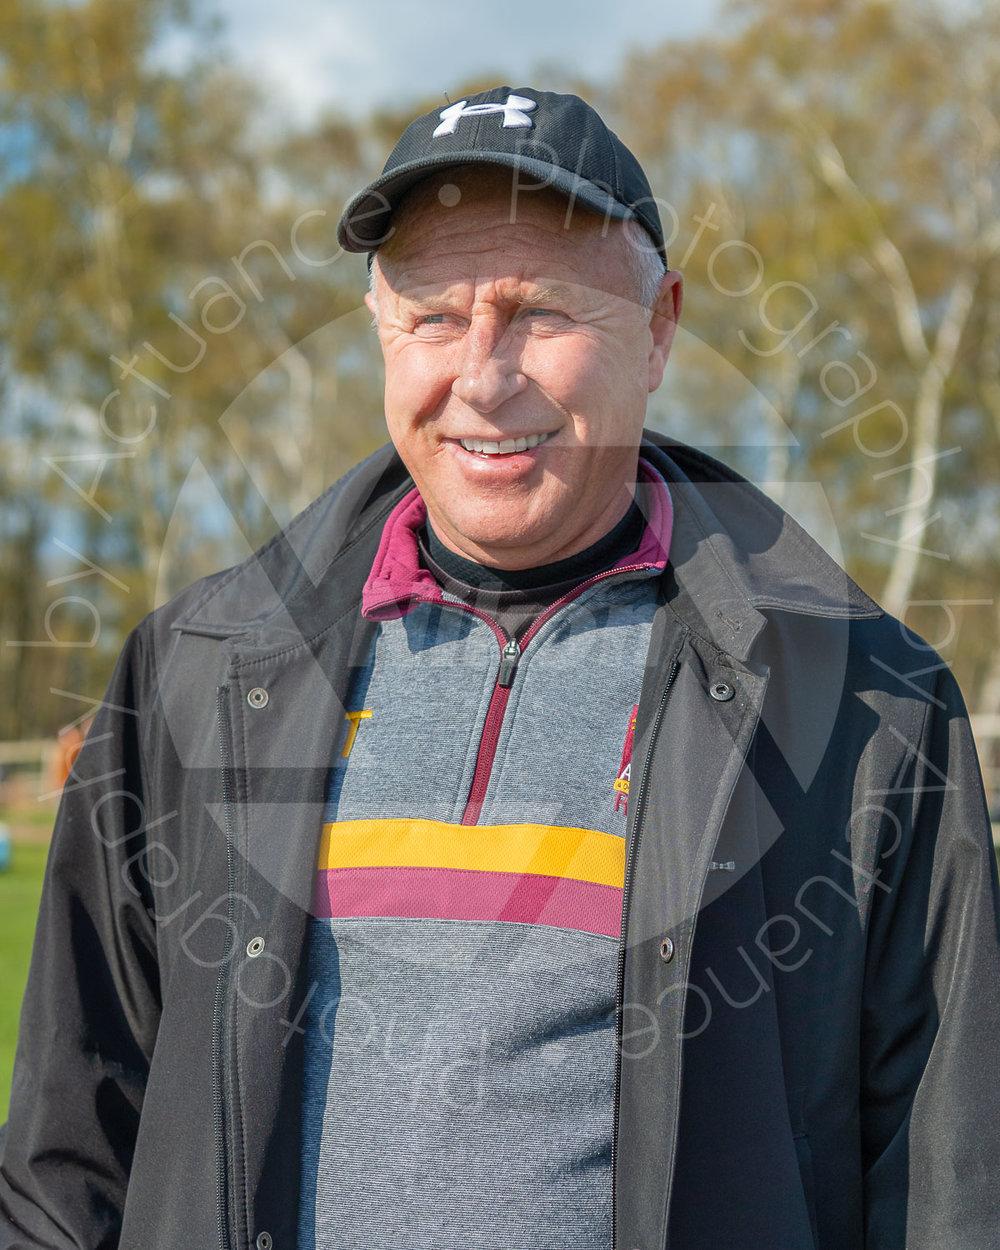 Paul Turner, post match (Photo: Iain Frankish, Actuance Photography)